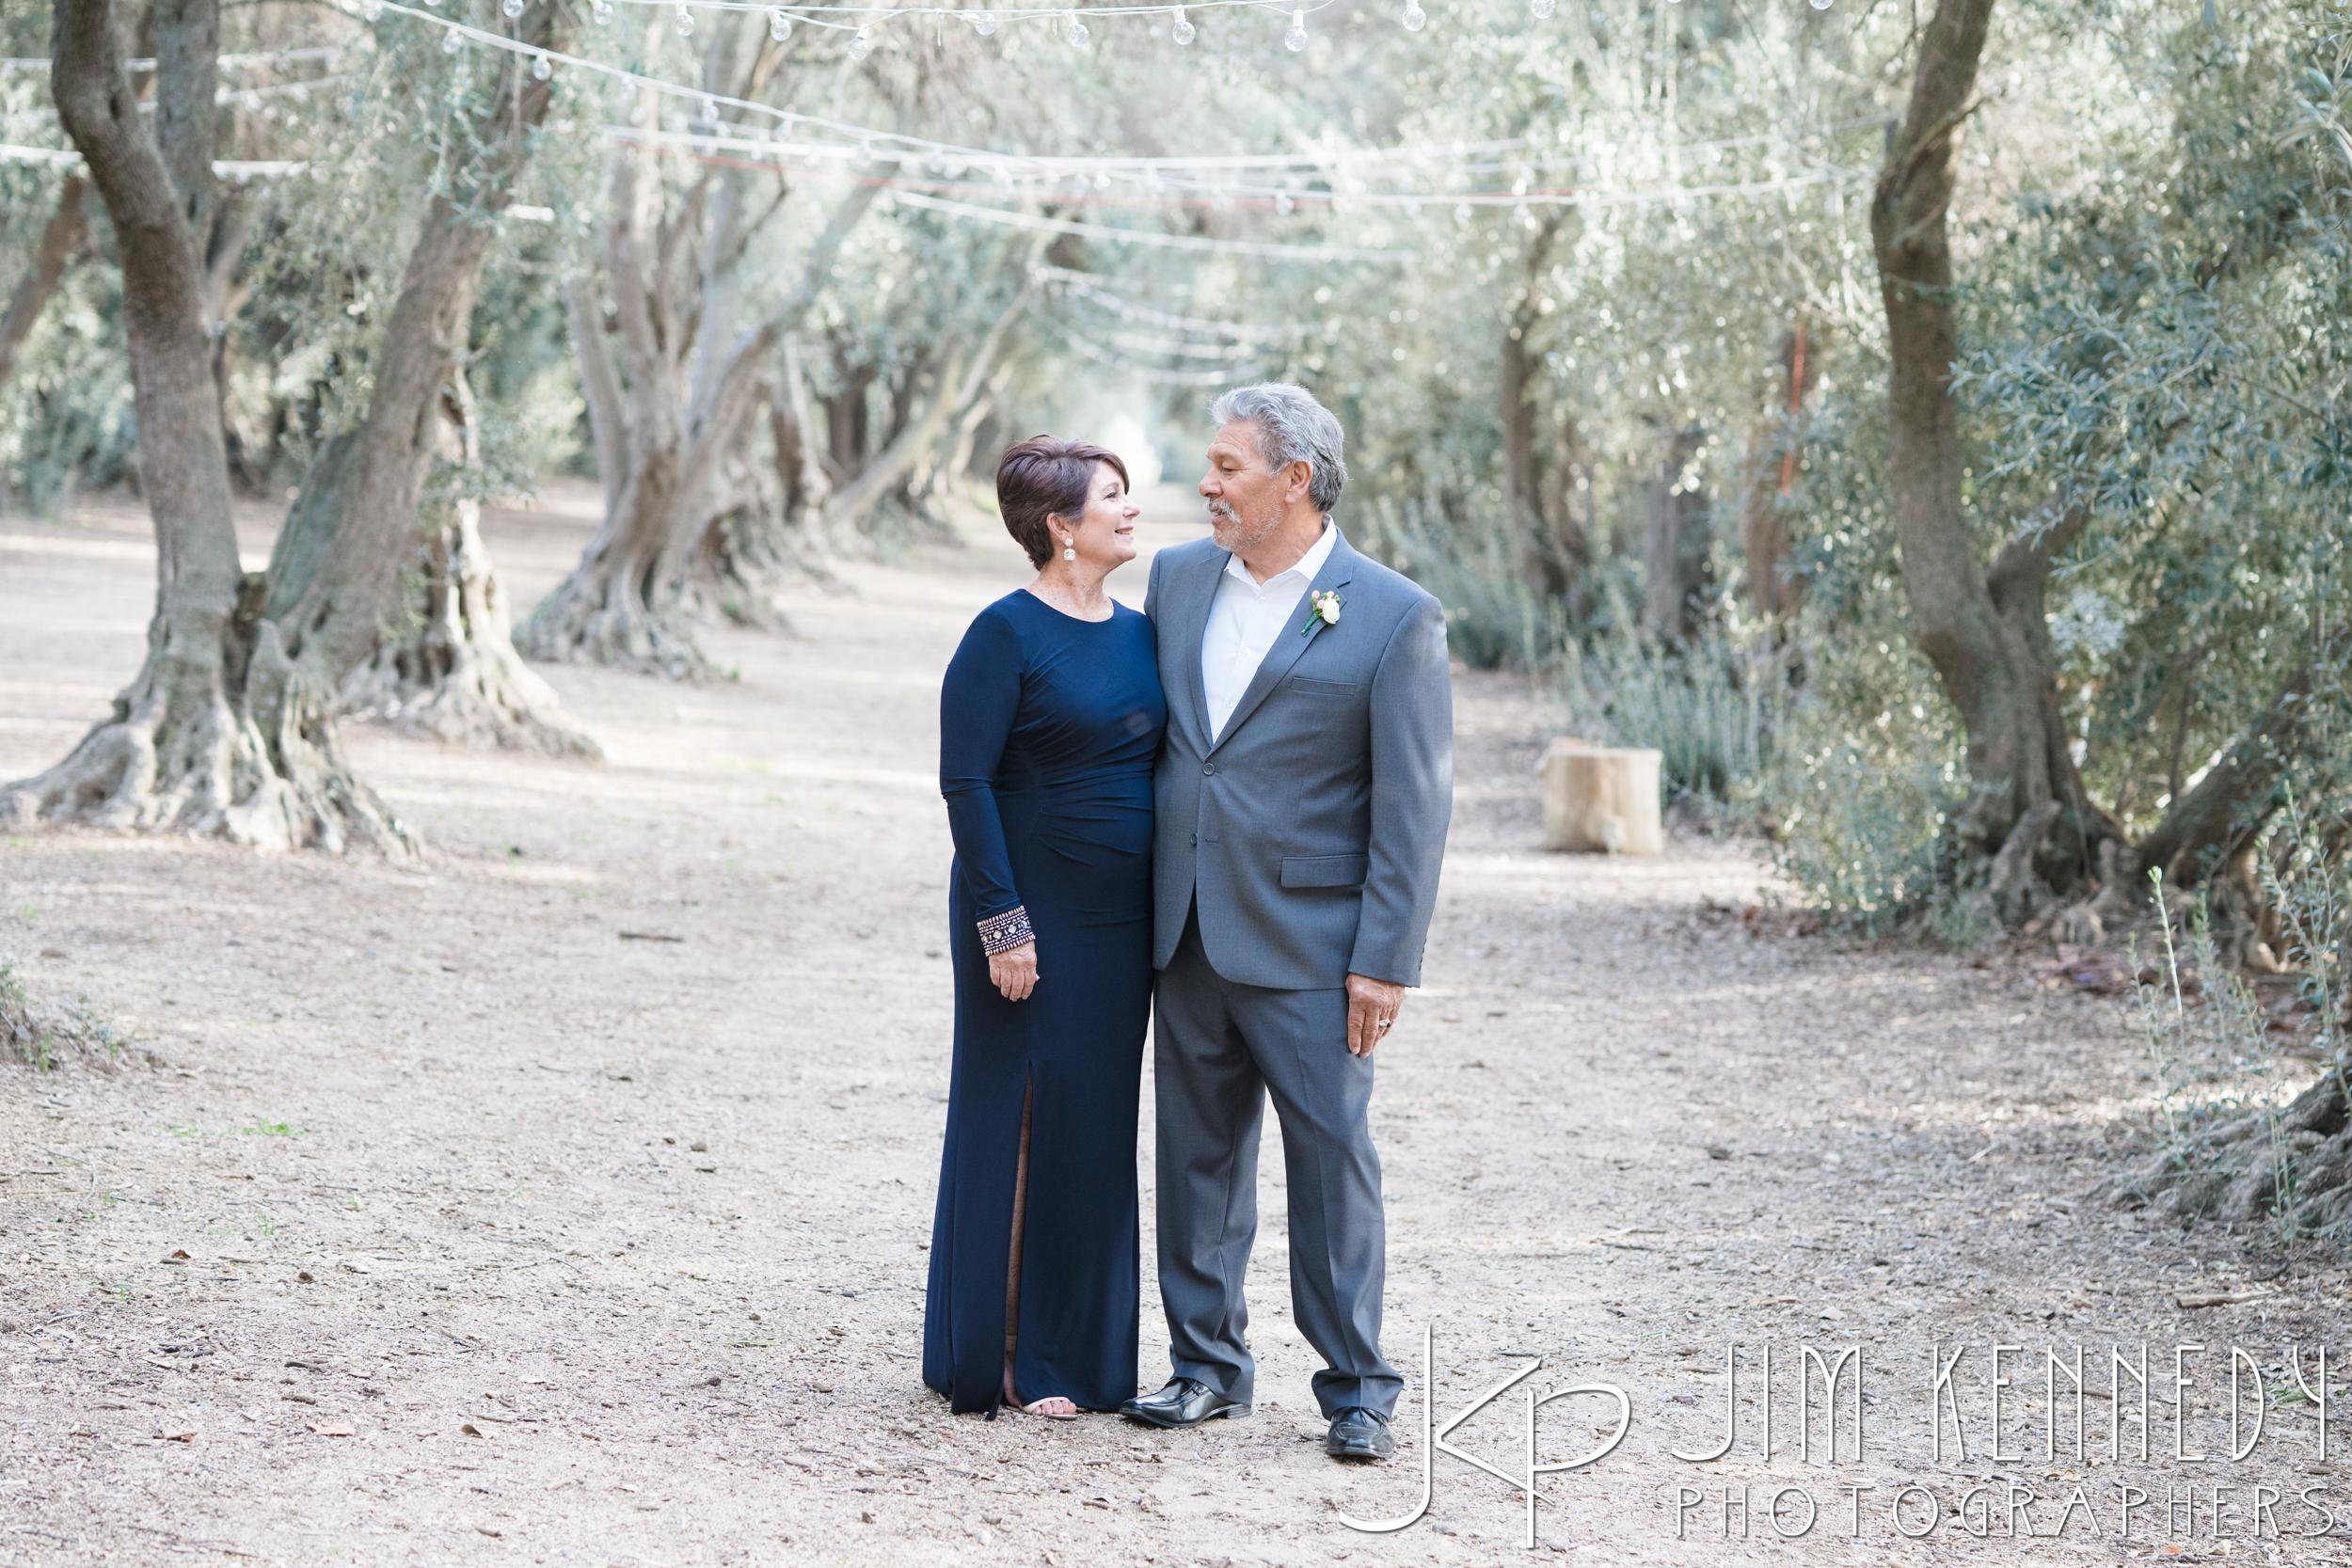 jim_kennedy_photographers_highland_springs_wedding_caitlyn_0084.jpg